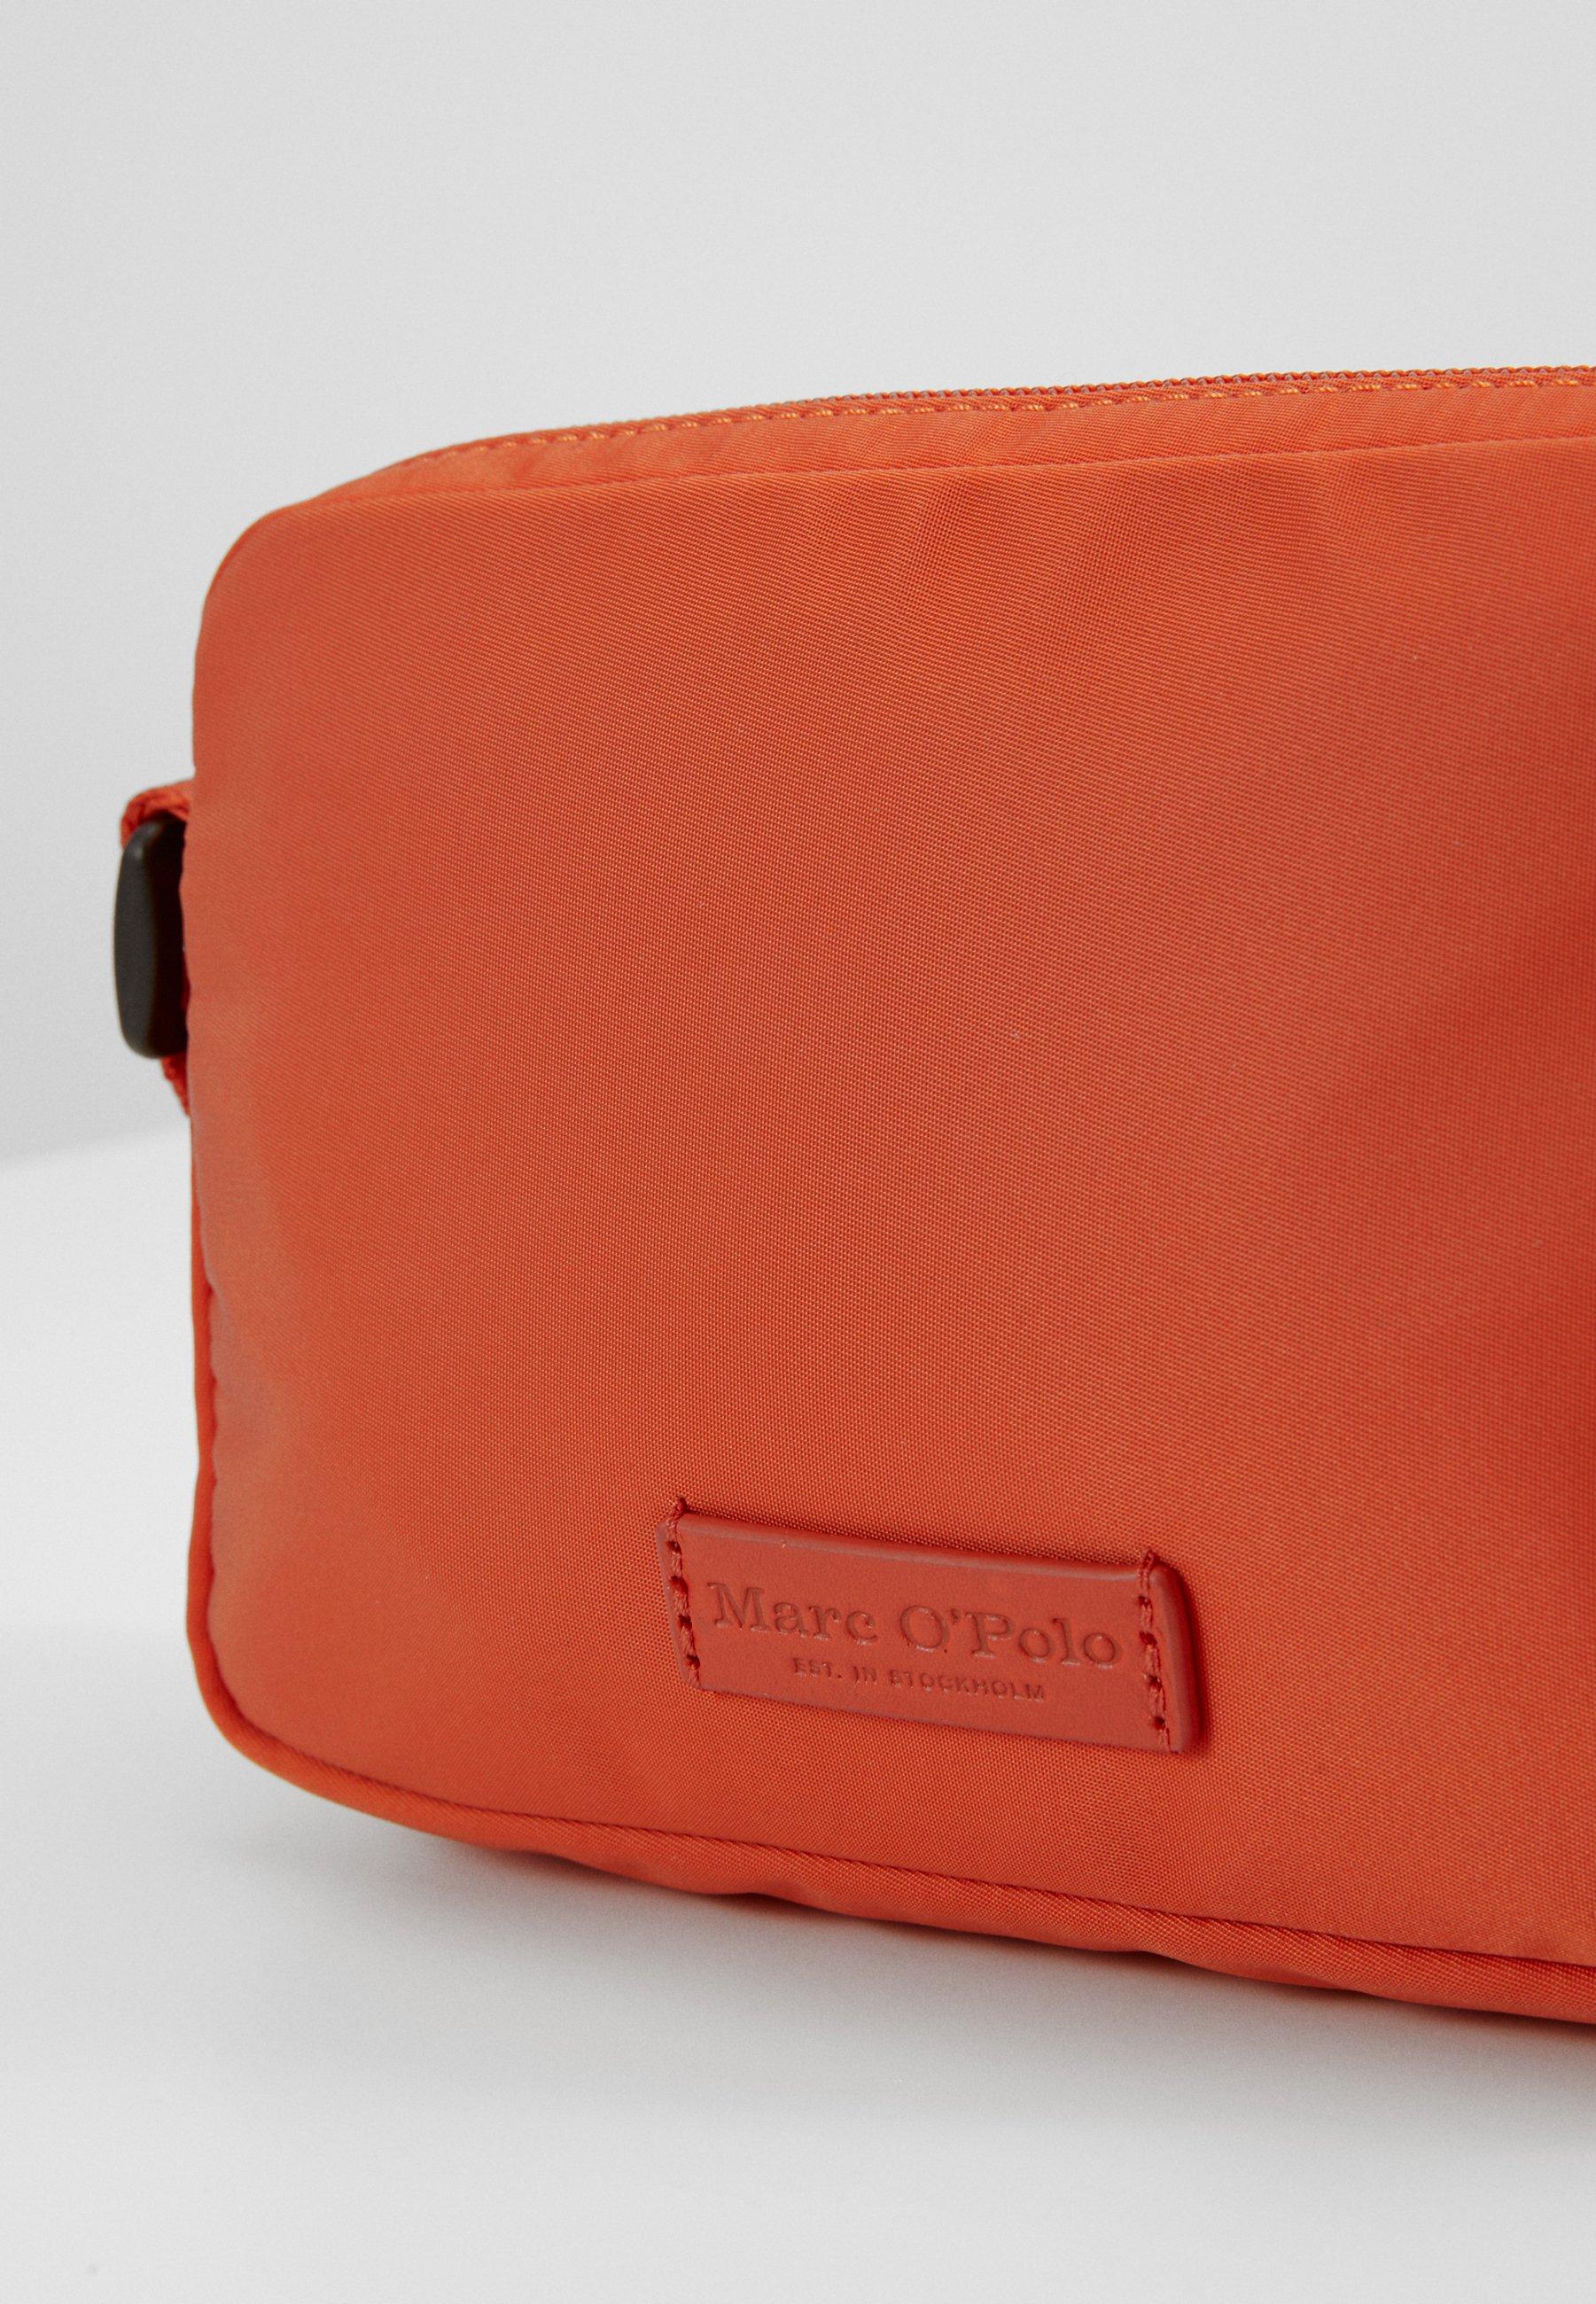 Clean And Classic Limit Offer Cheap Accessories Marc O'Polo Across body bag pumpkin orange nUCFeI6So jlkb7tTFd